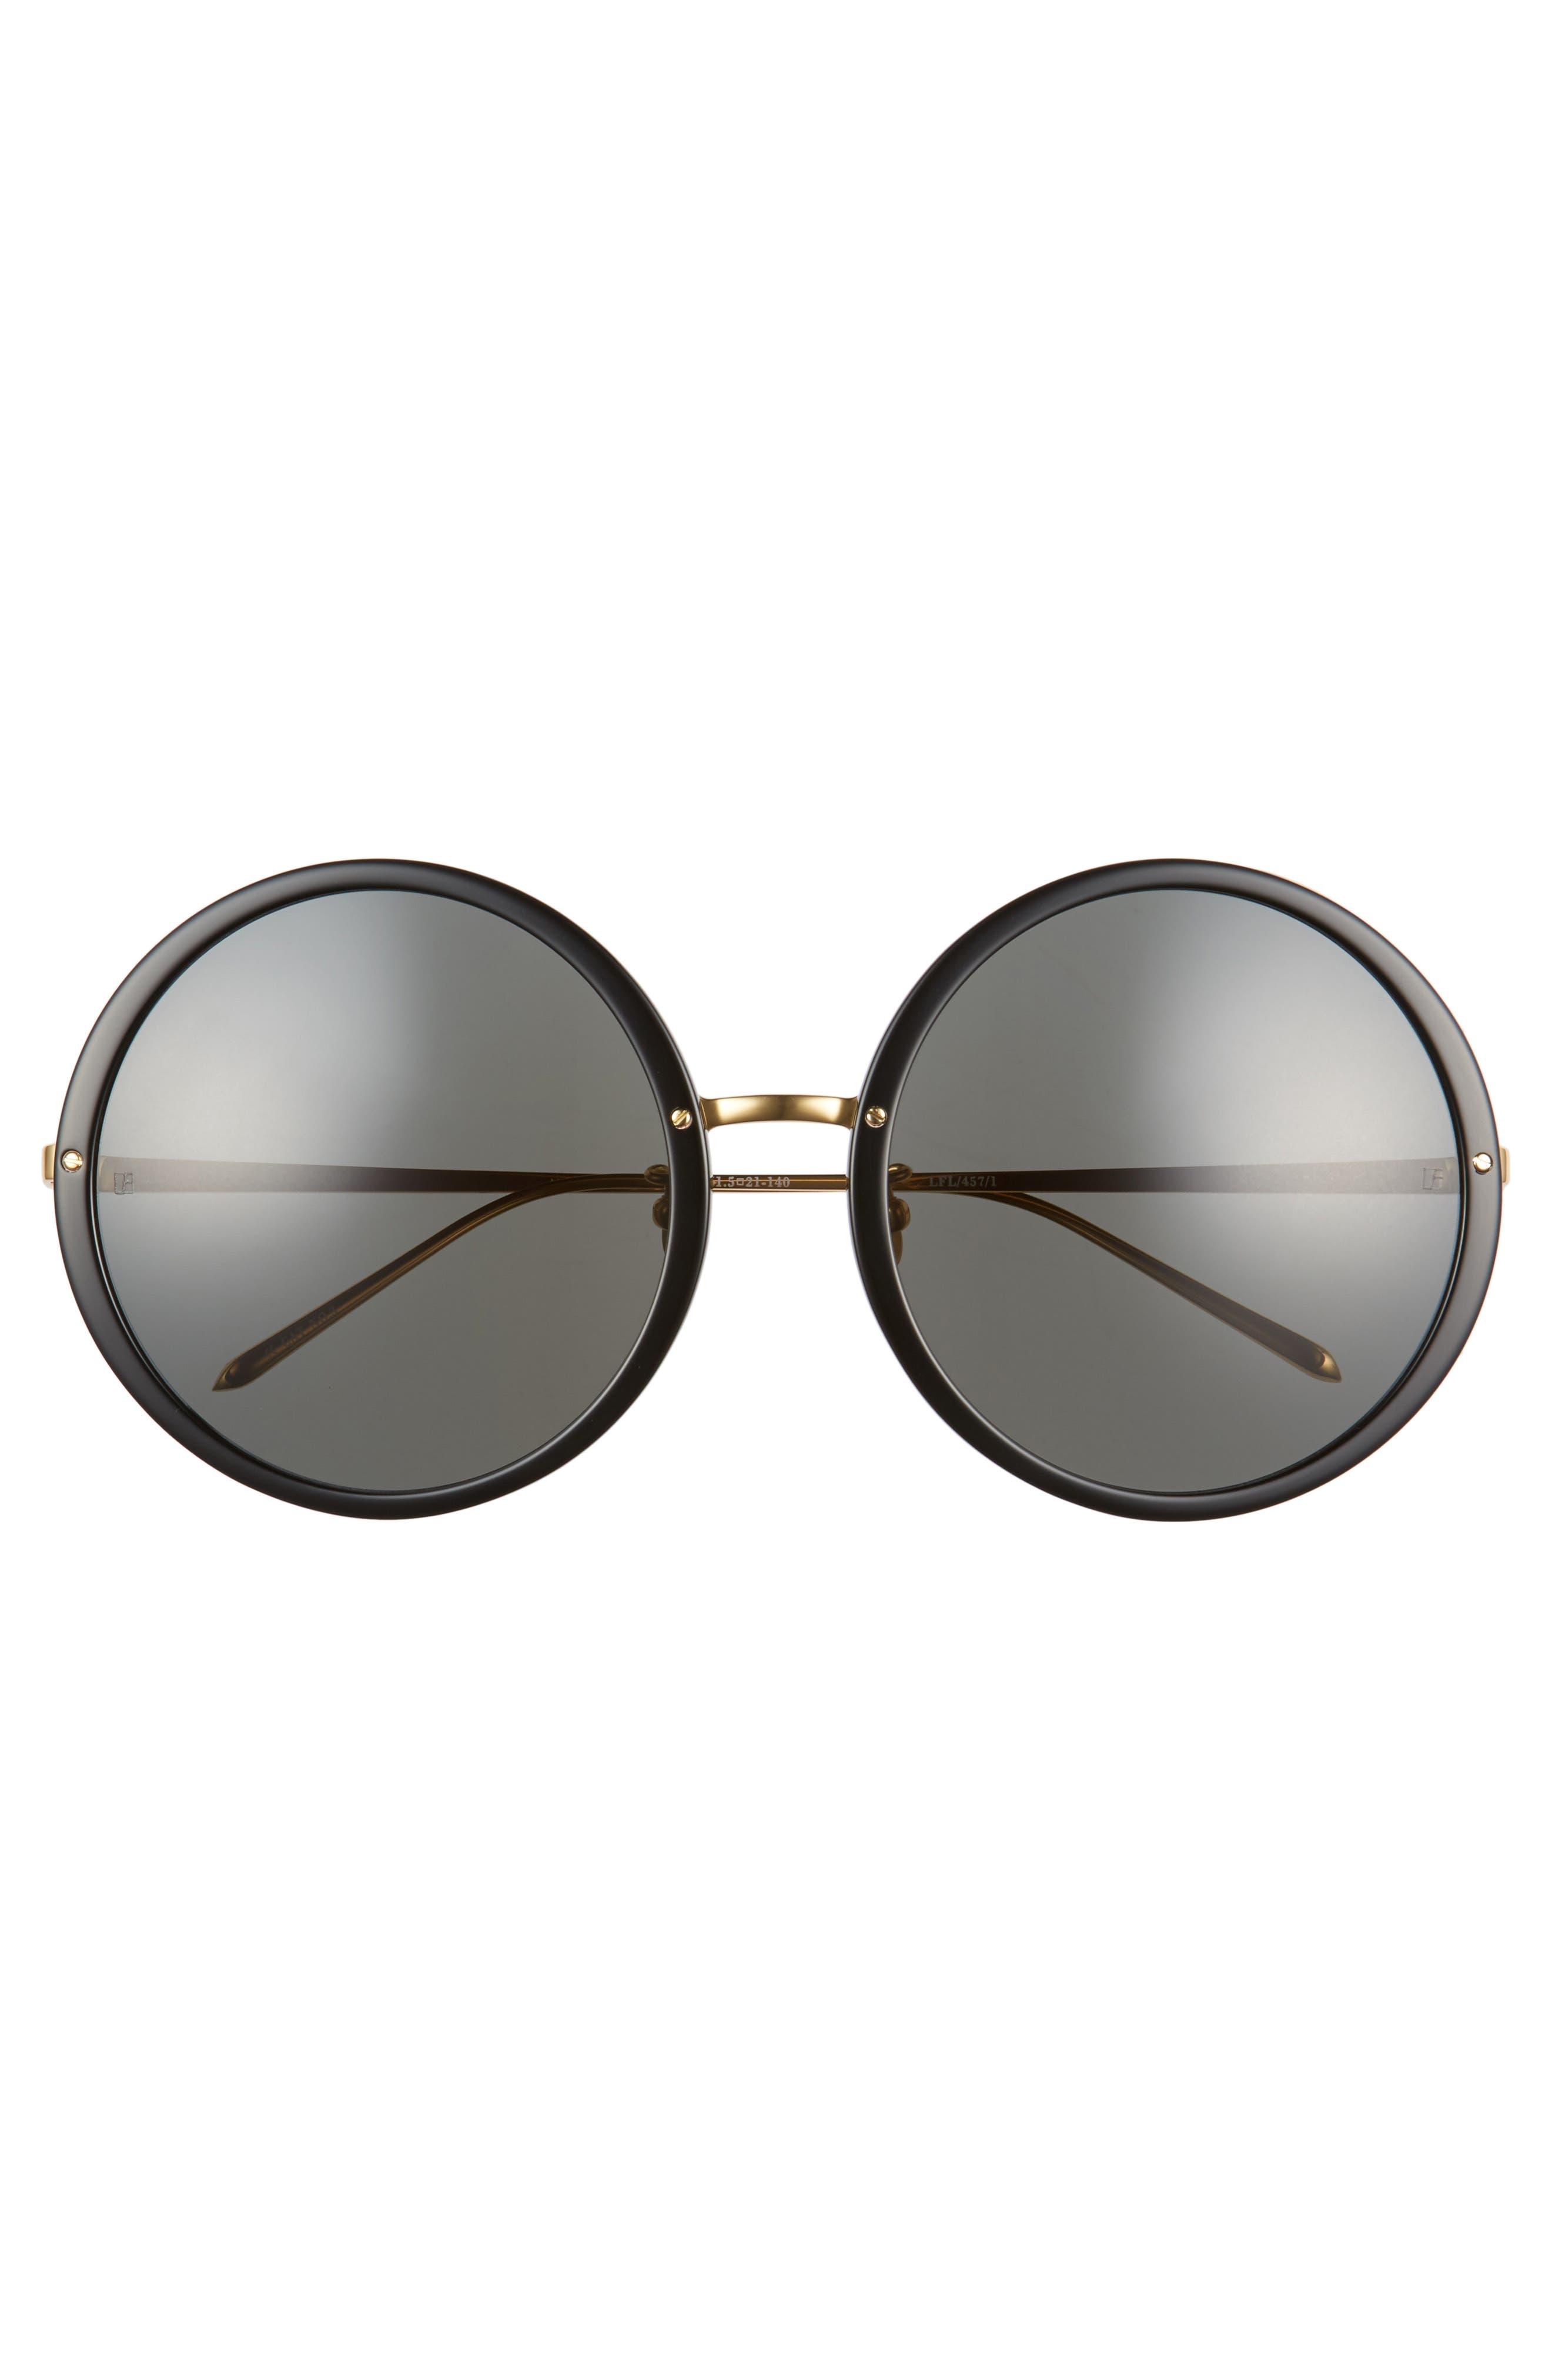 61mm Round 18 Karat Gold Trim Sunglasses,                             Alternate thumbnail 3, color,                             BLACK/ YELLOW GOLD/ GREY